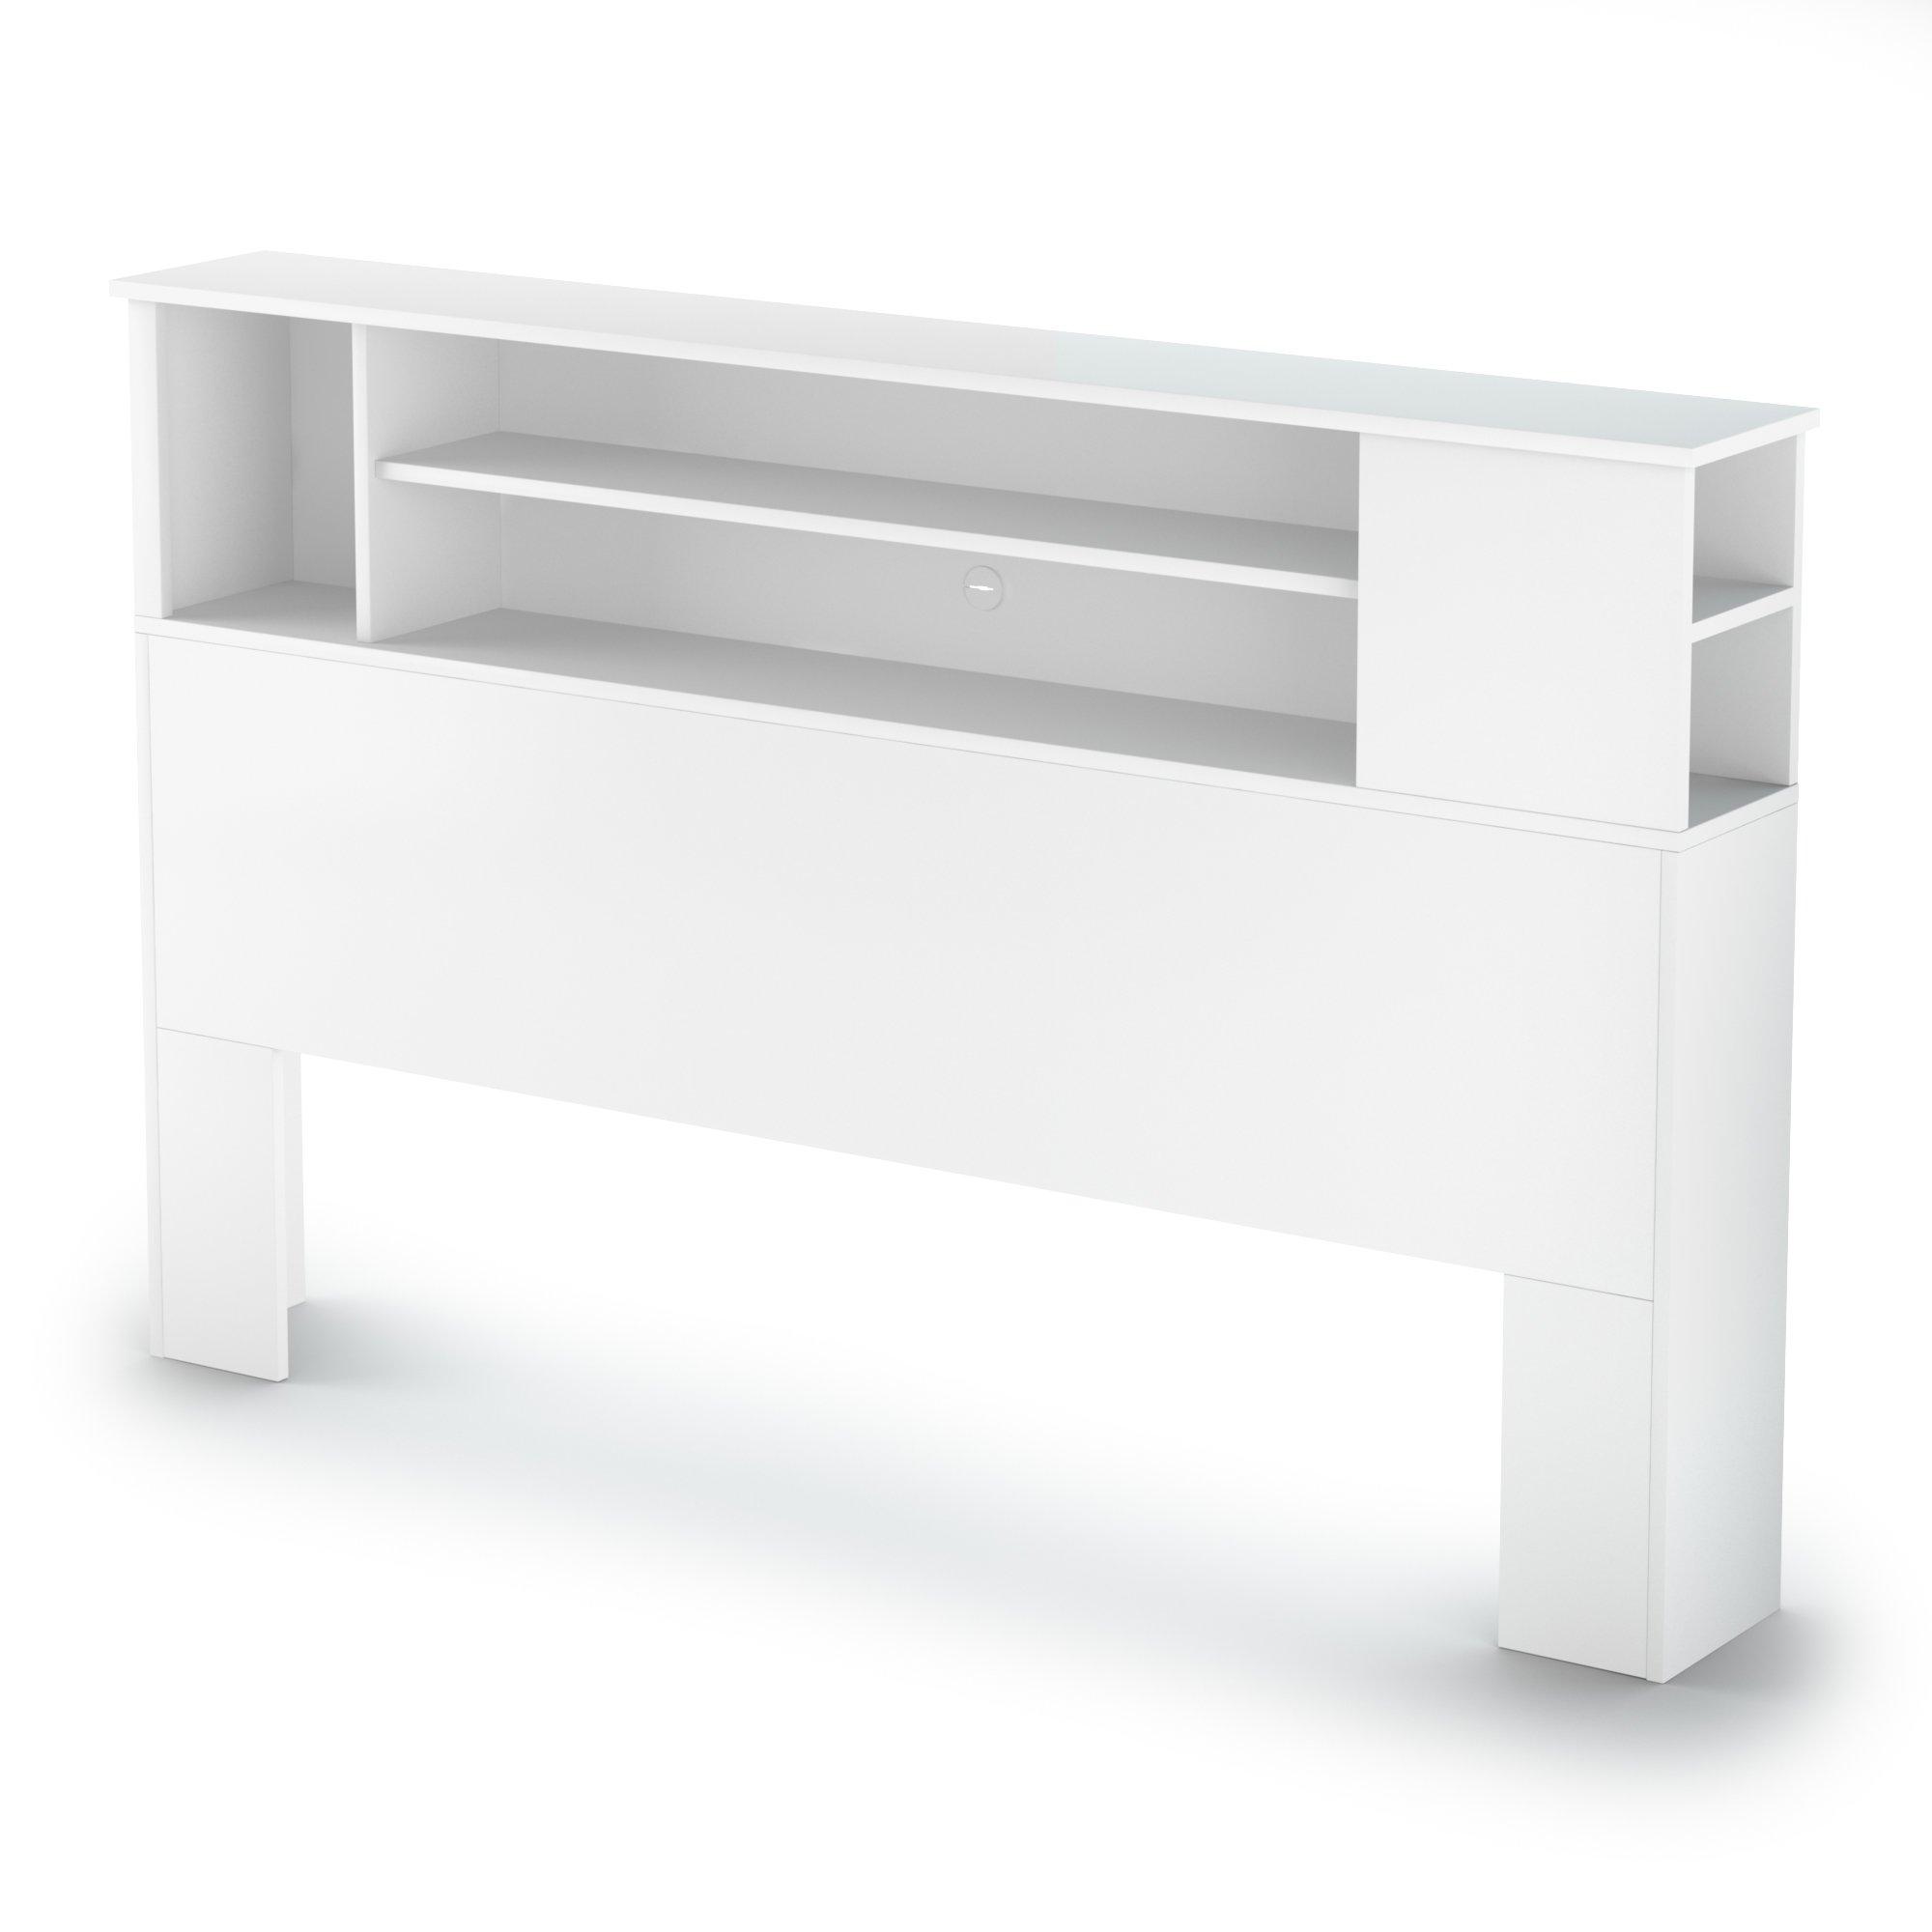 South Shore Vito Bookcase Headboard with Storage, Full/Queen 54/60-inch, Pure White